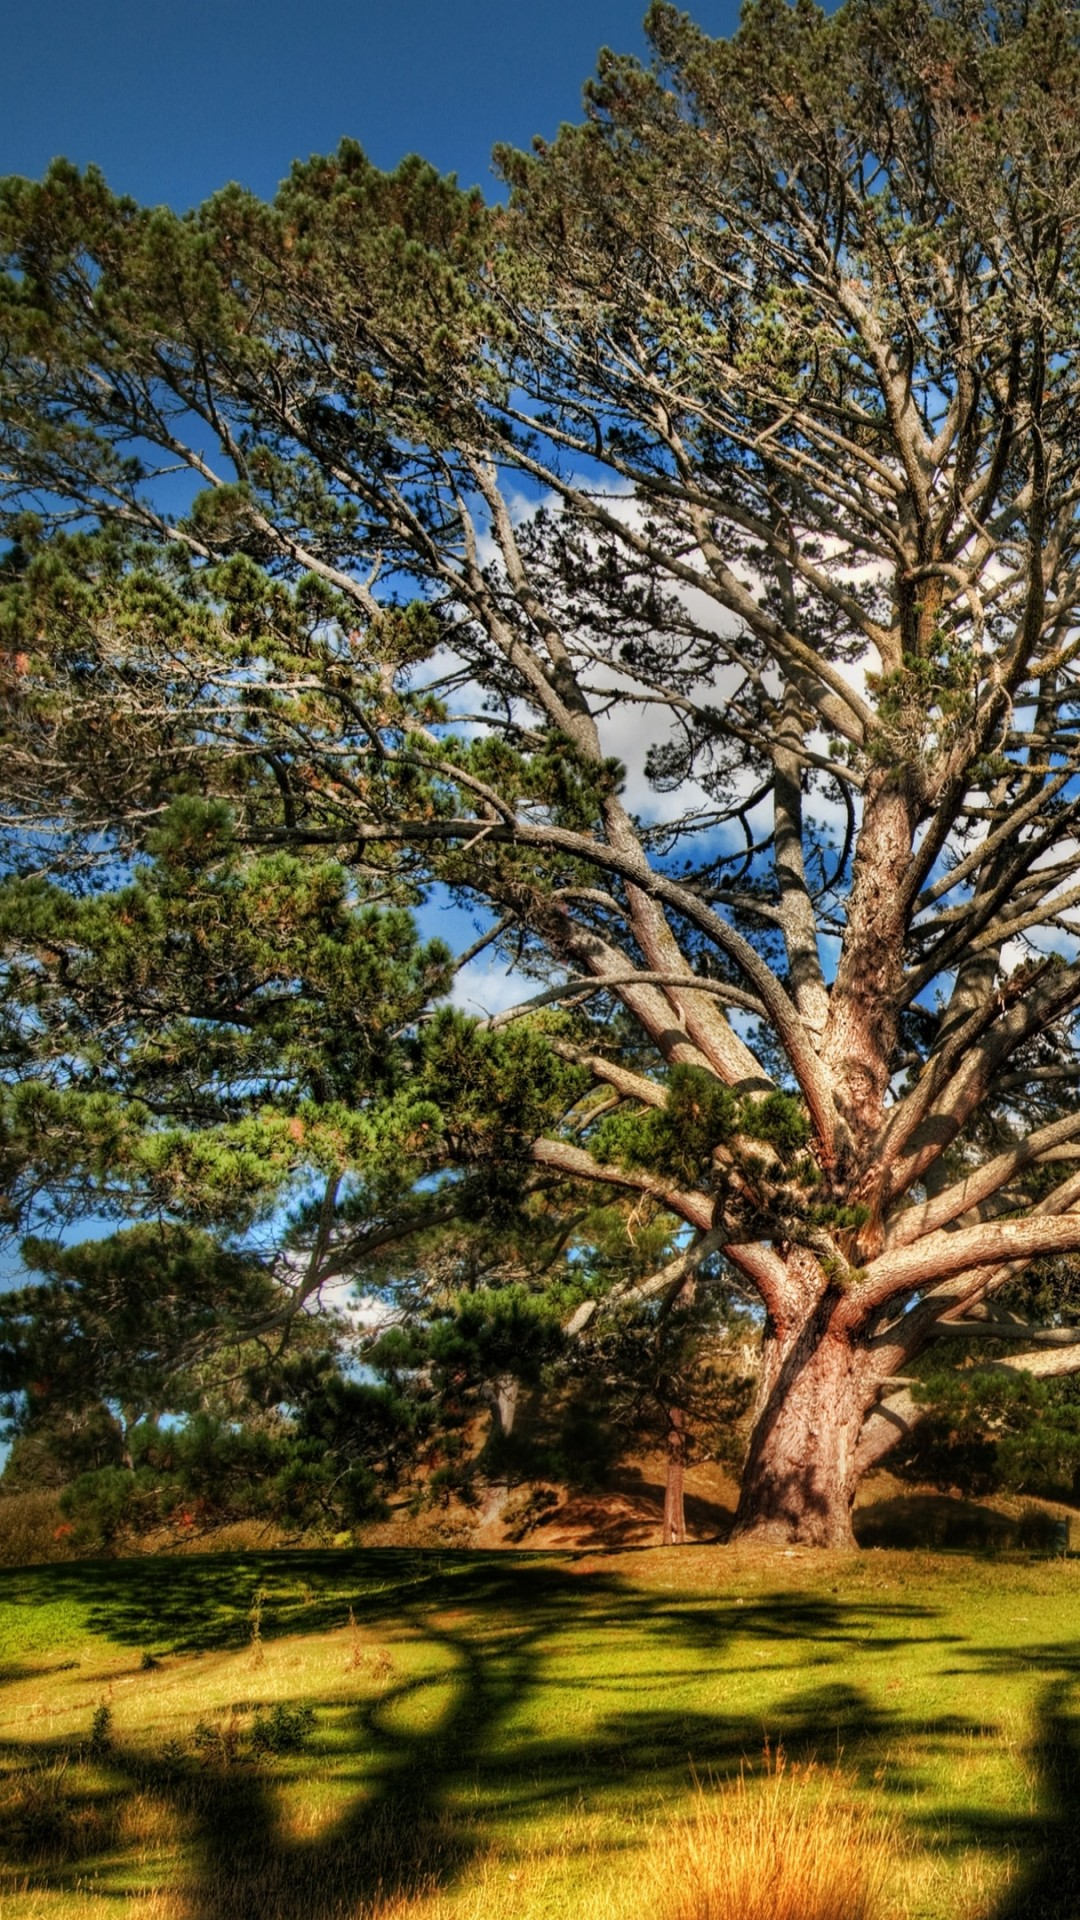 Wallpaper Tree, 4k, HD Wallpaper, Sky, Meadows, Nature #5260